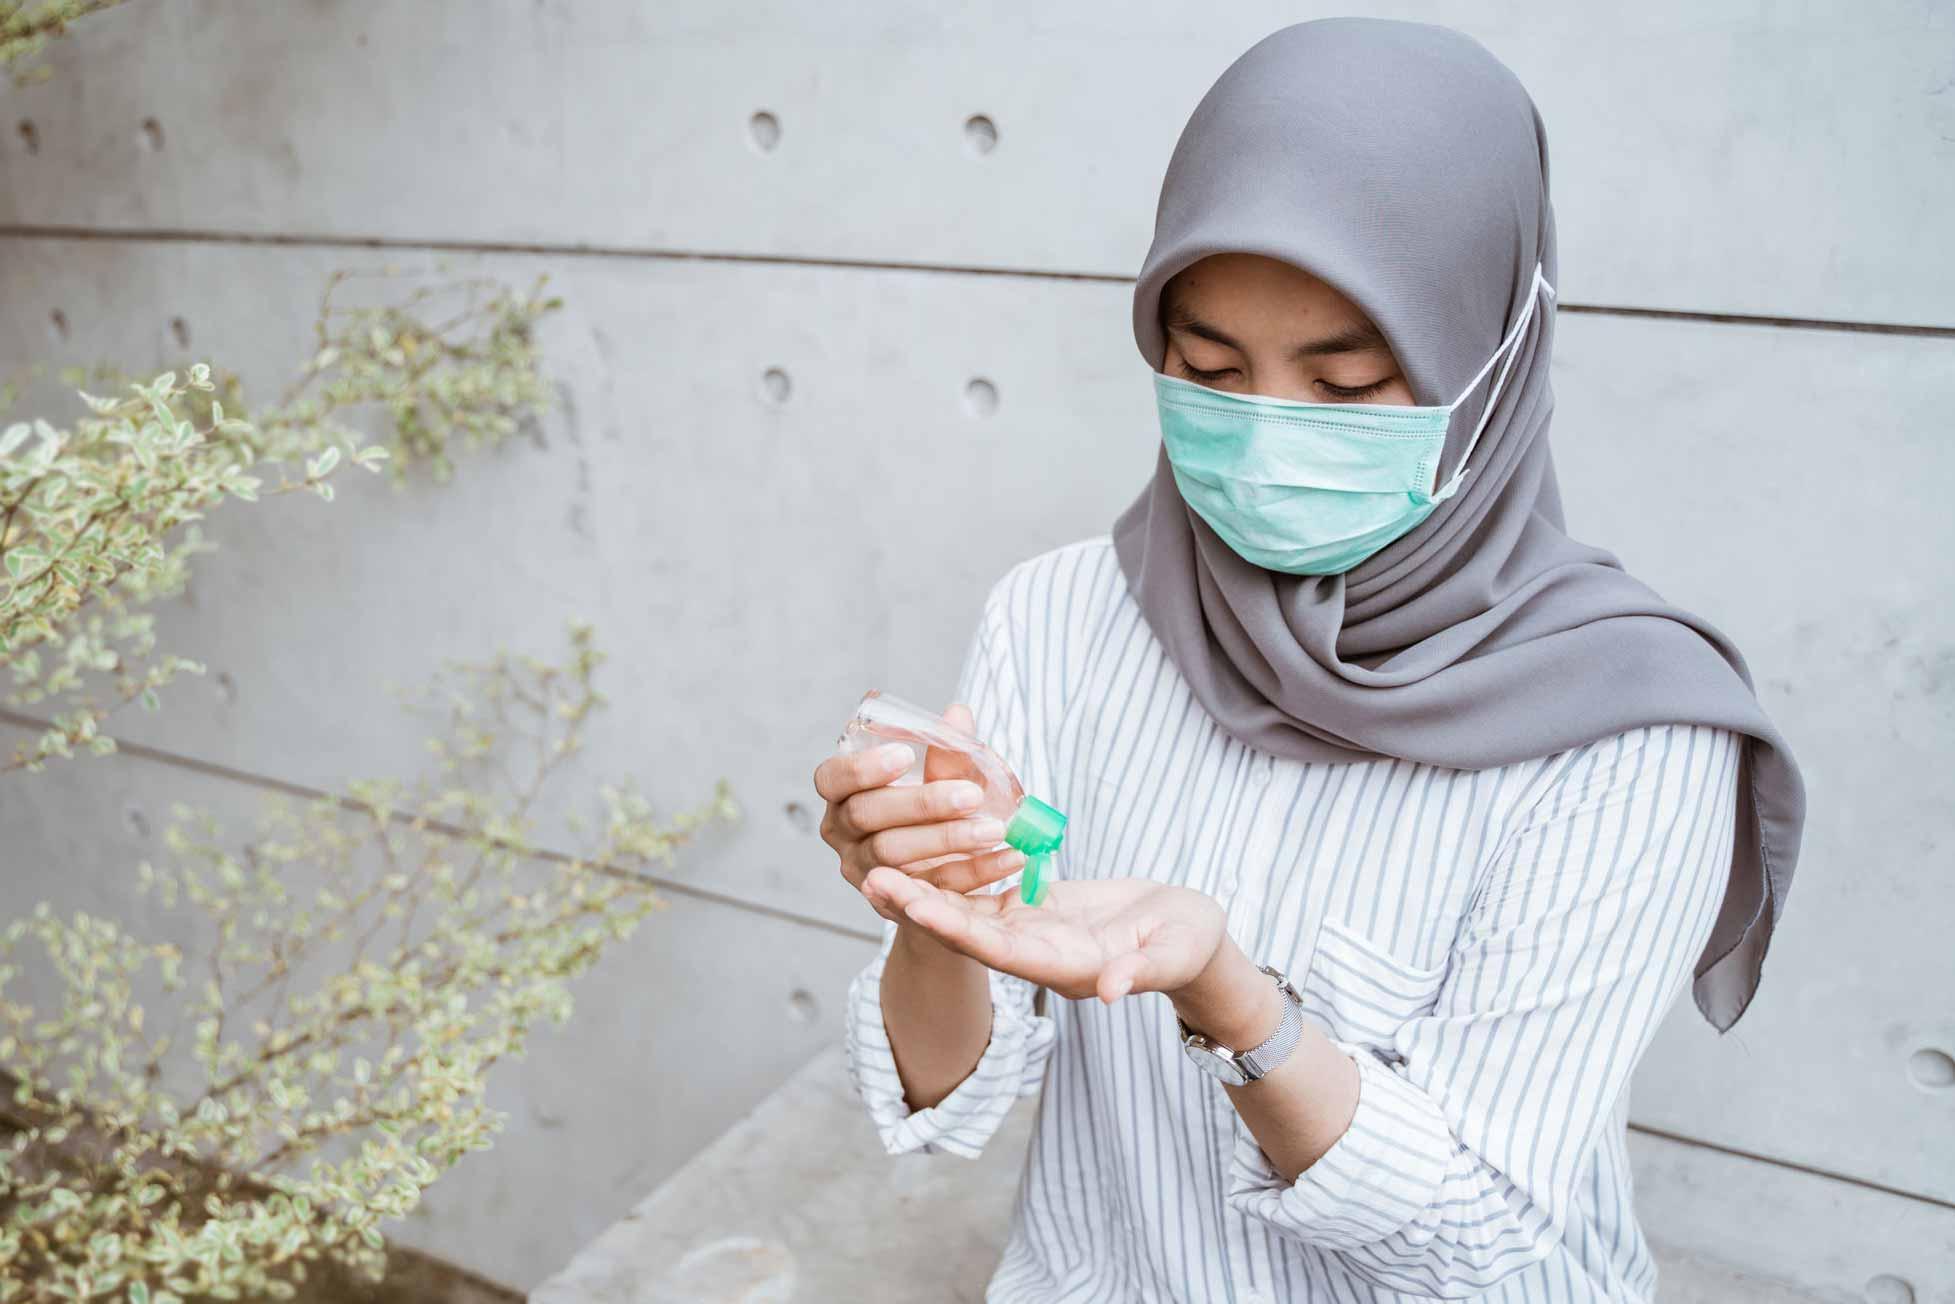 Mujer en máscara aplicando desinfectante de manos